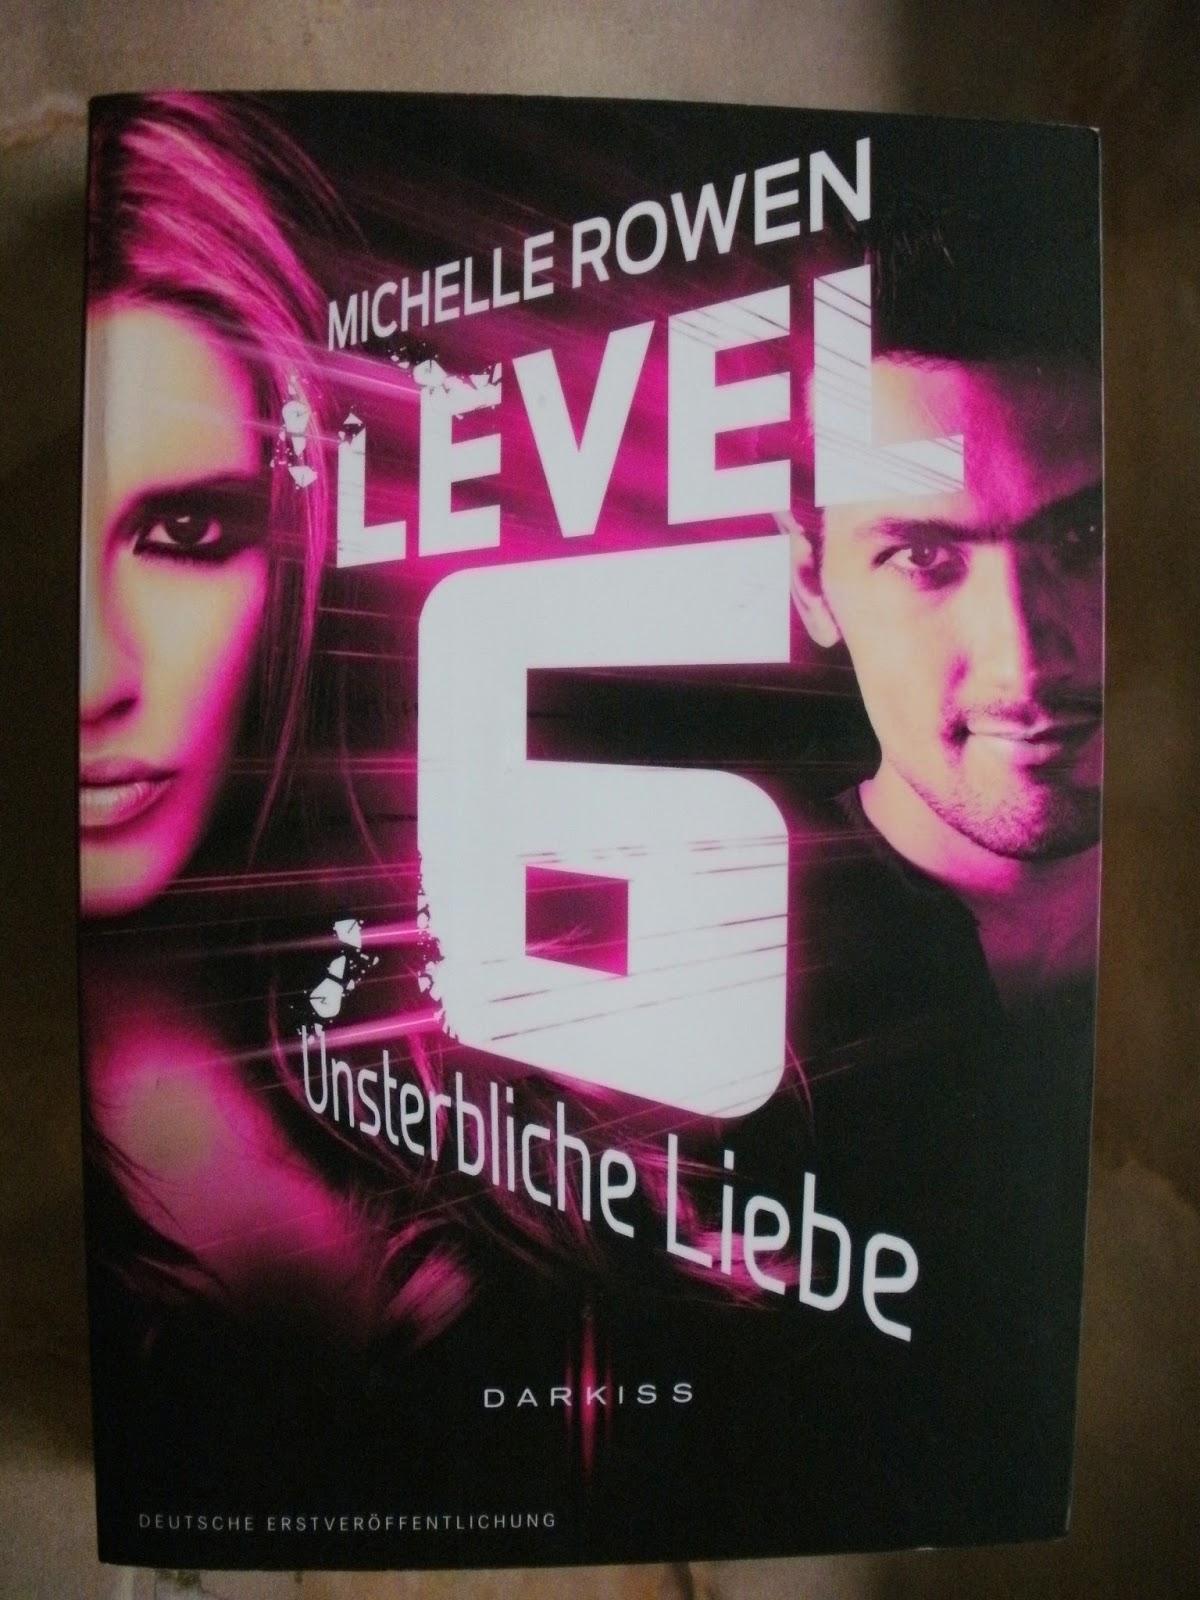 http://www.amazon.de/Level-Unsterbliche-Liebe-Michelle-Rowen/dp/3862788784/ref=sr_1_1?ie=UTF8&qid=1429120991&sr=8-1&keywords=level+6